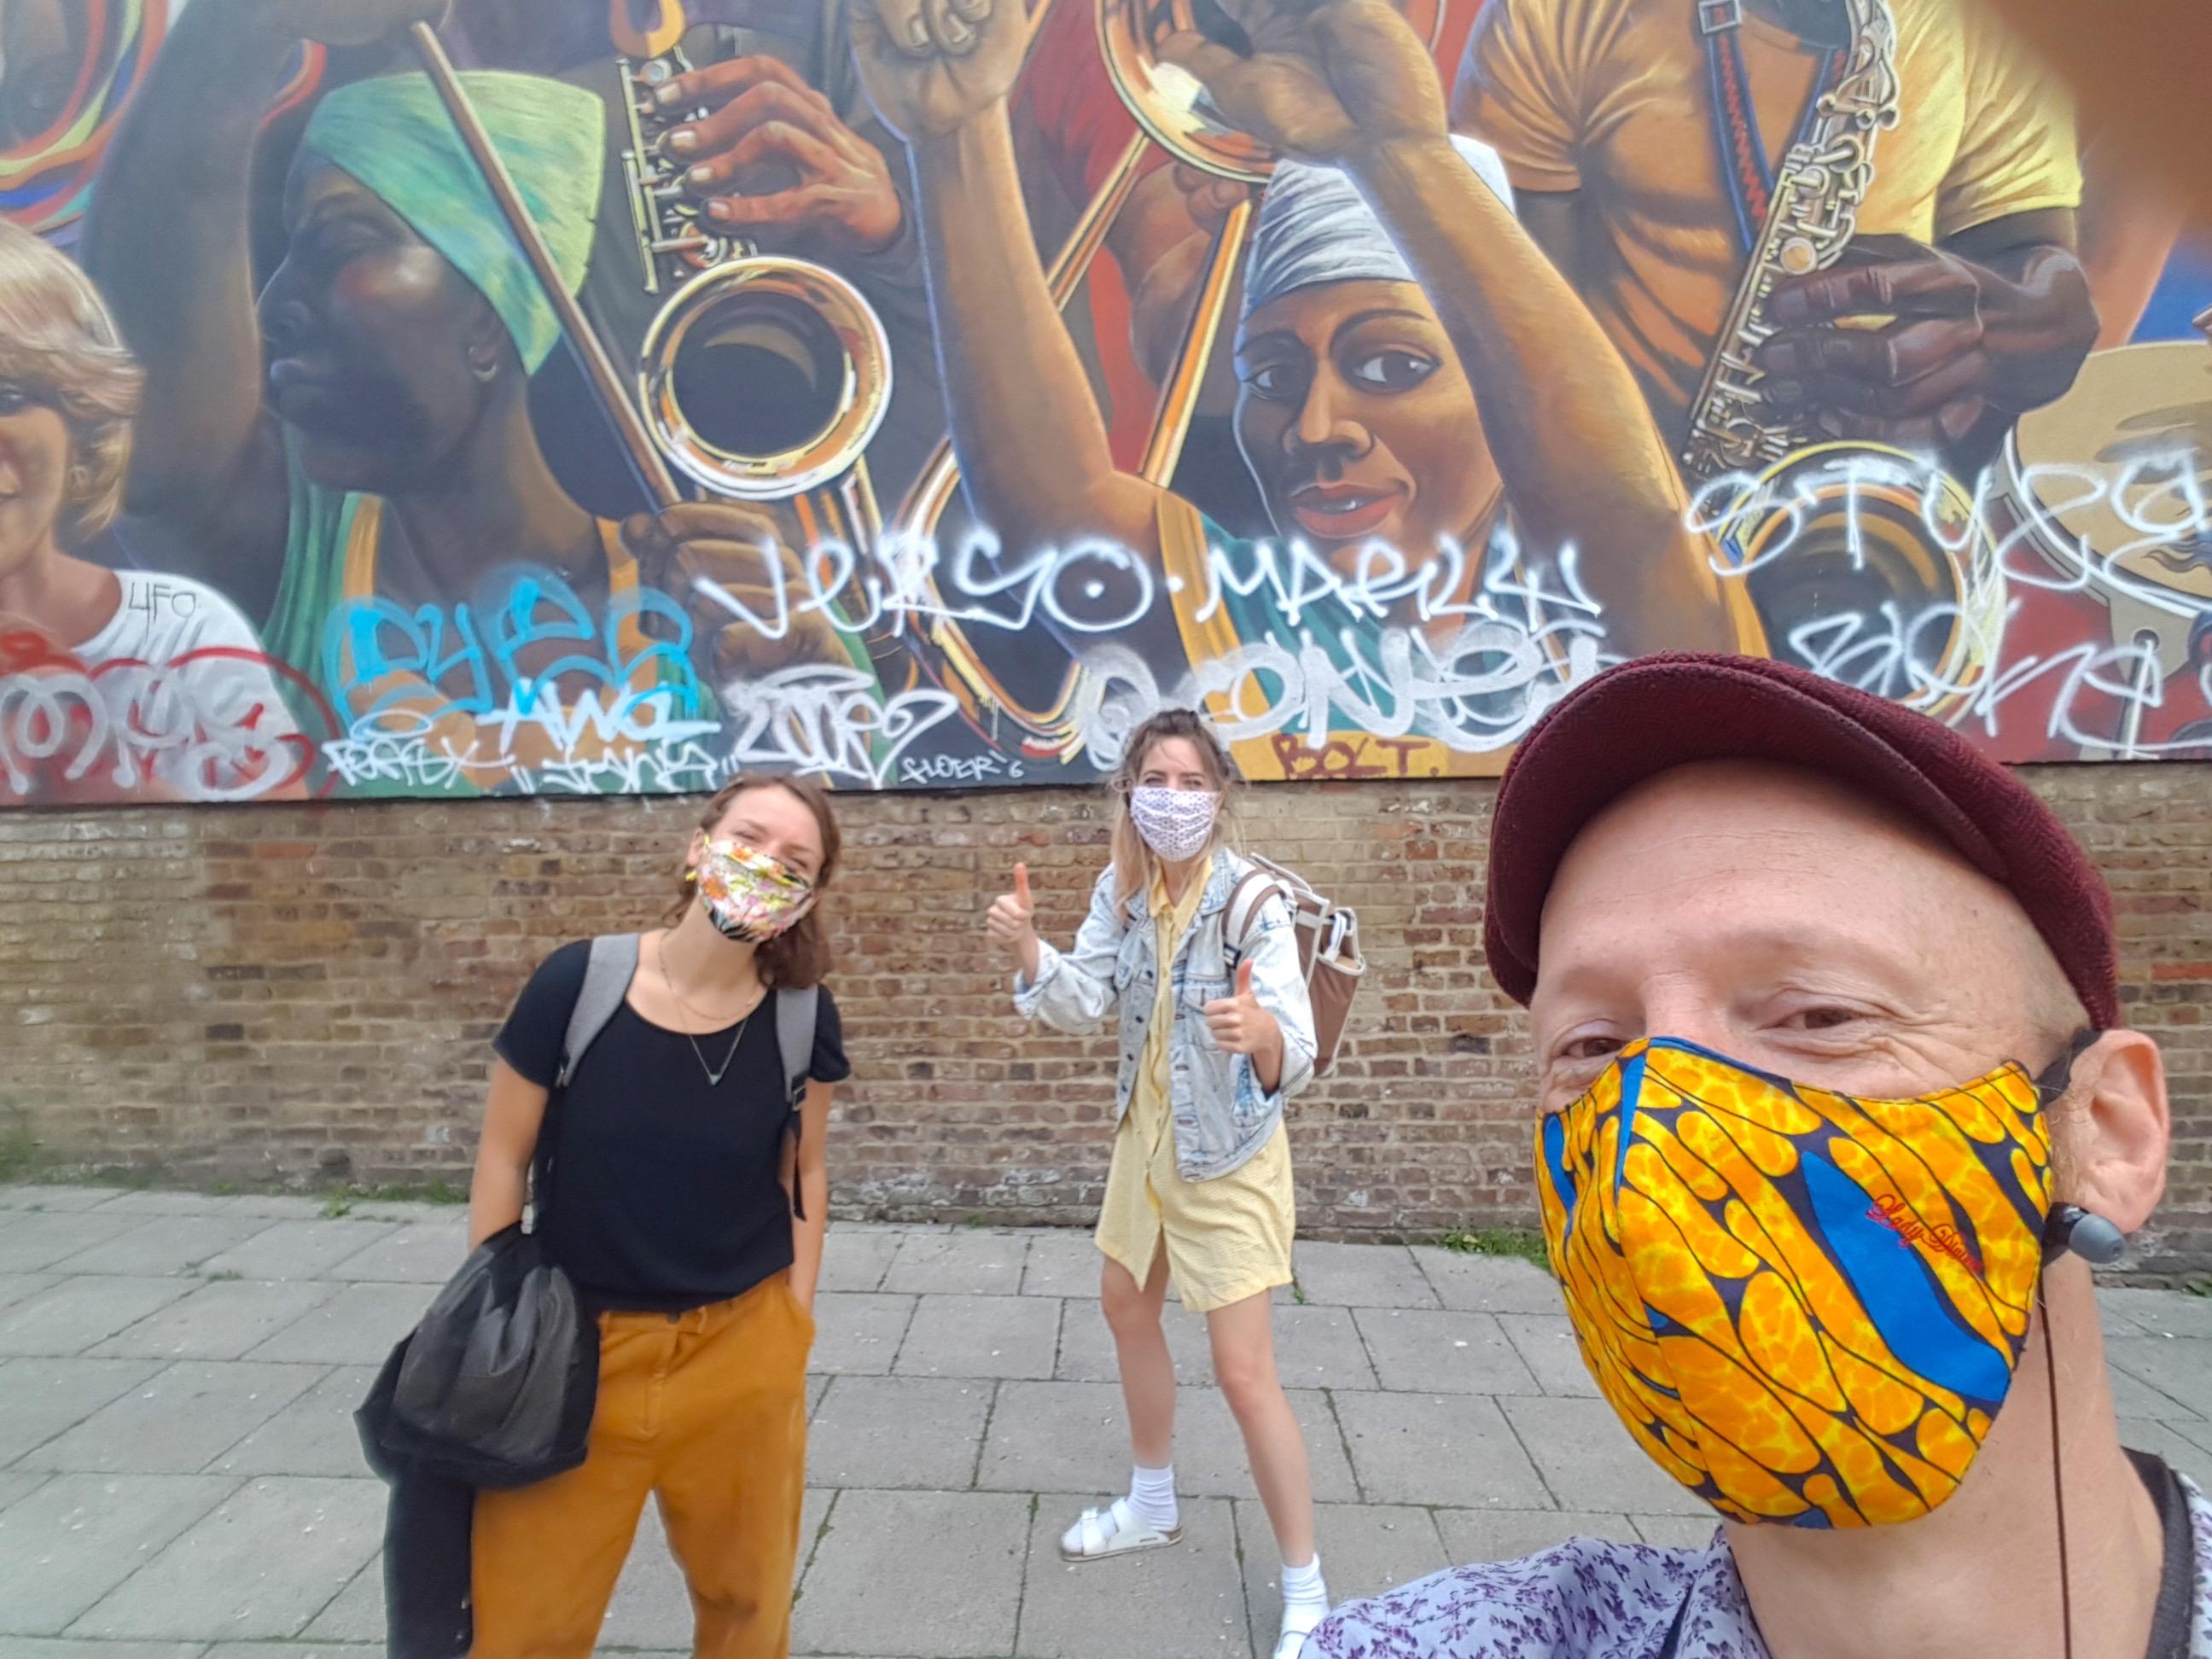 Funzing pic masks Dalston peace mural tour tweaked